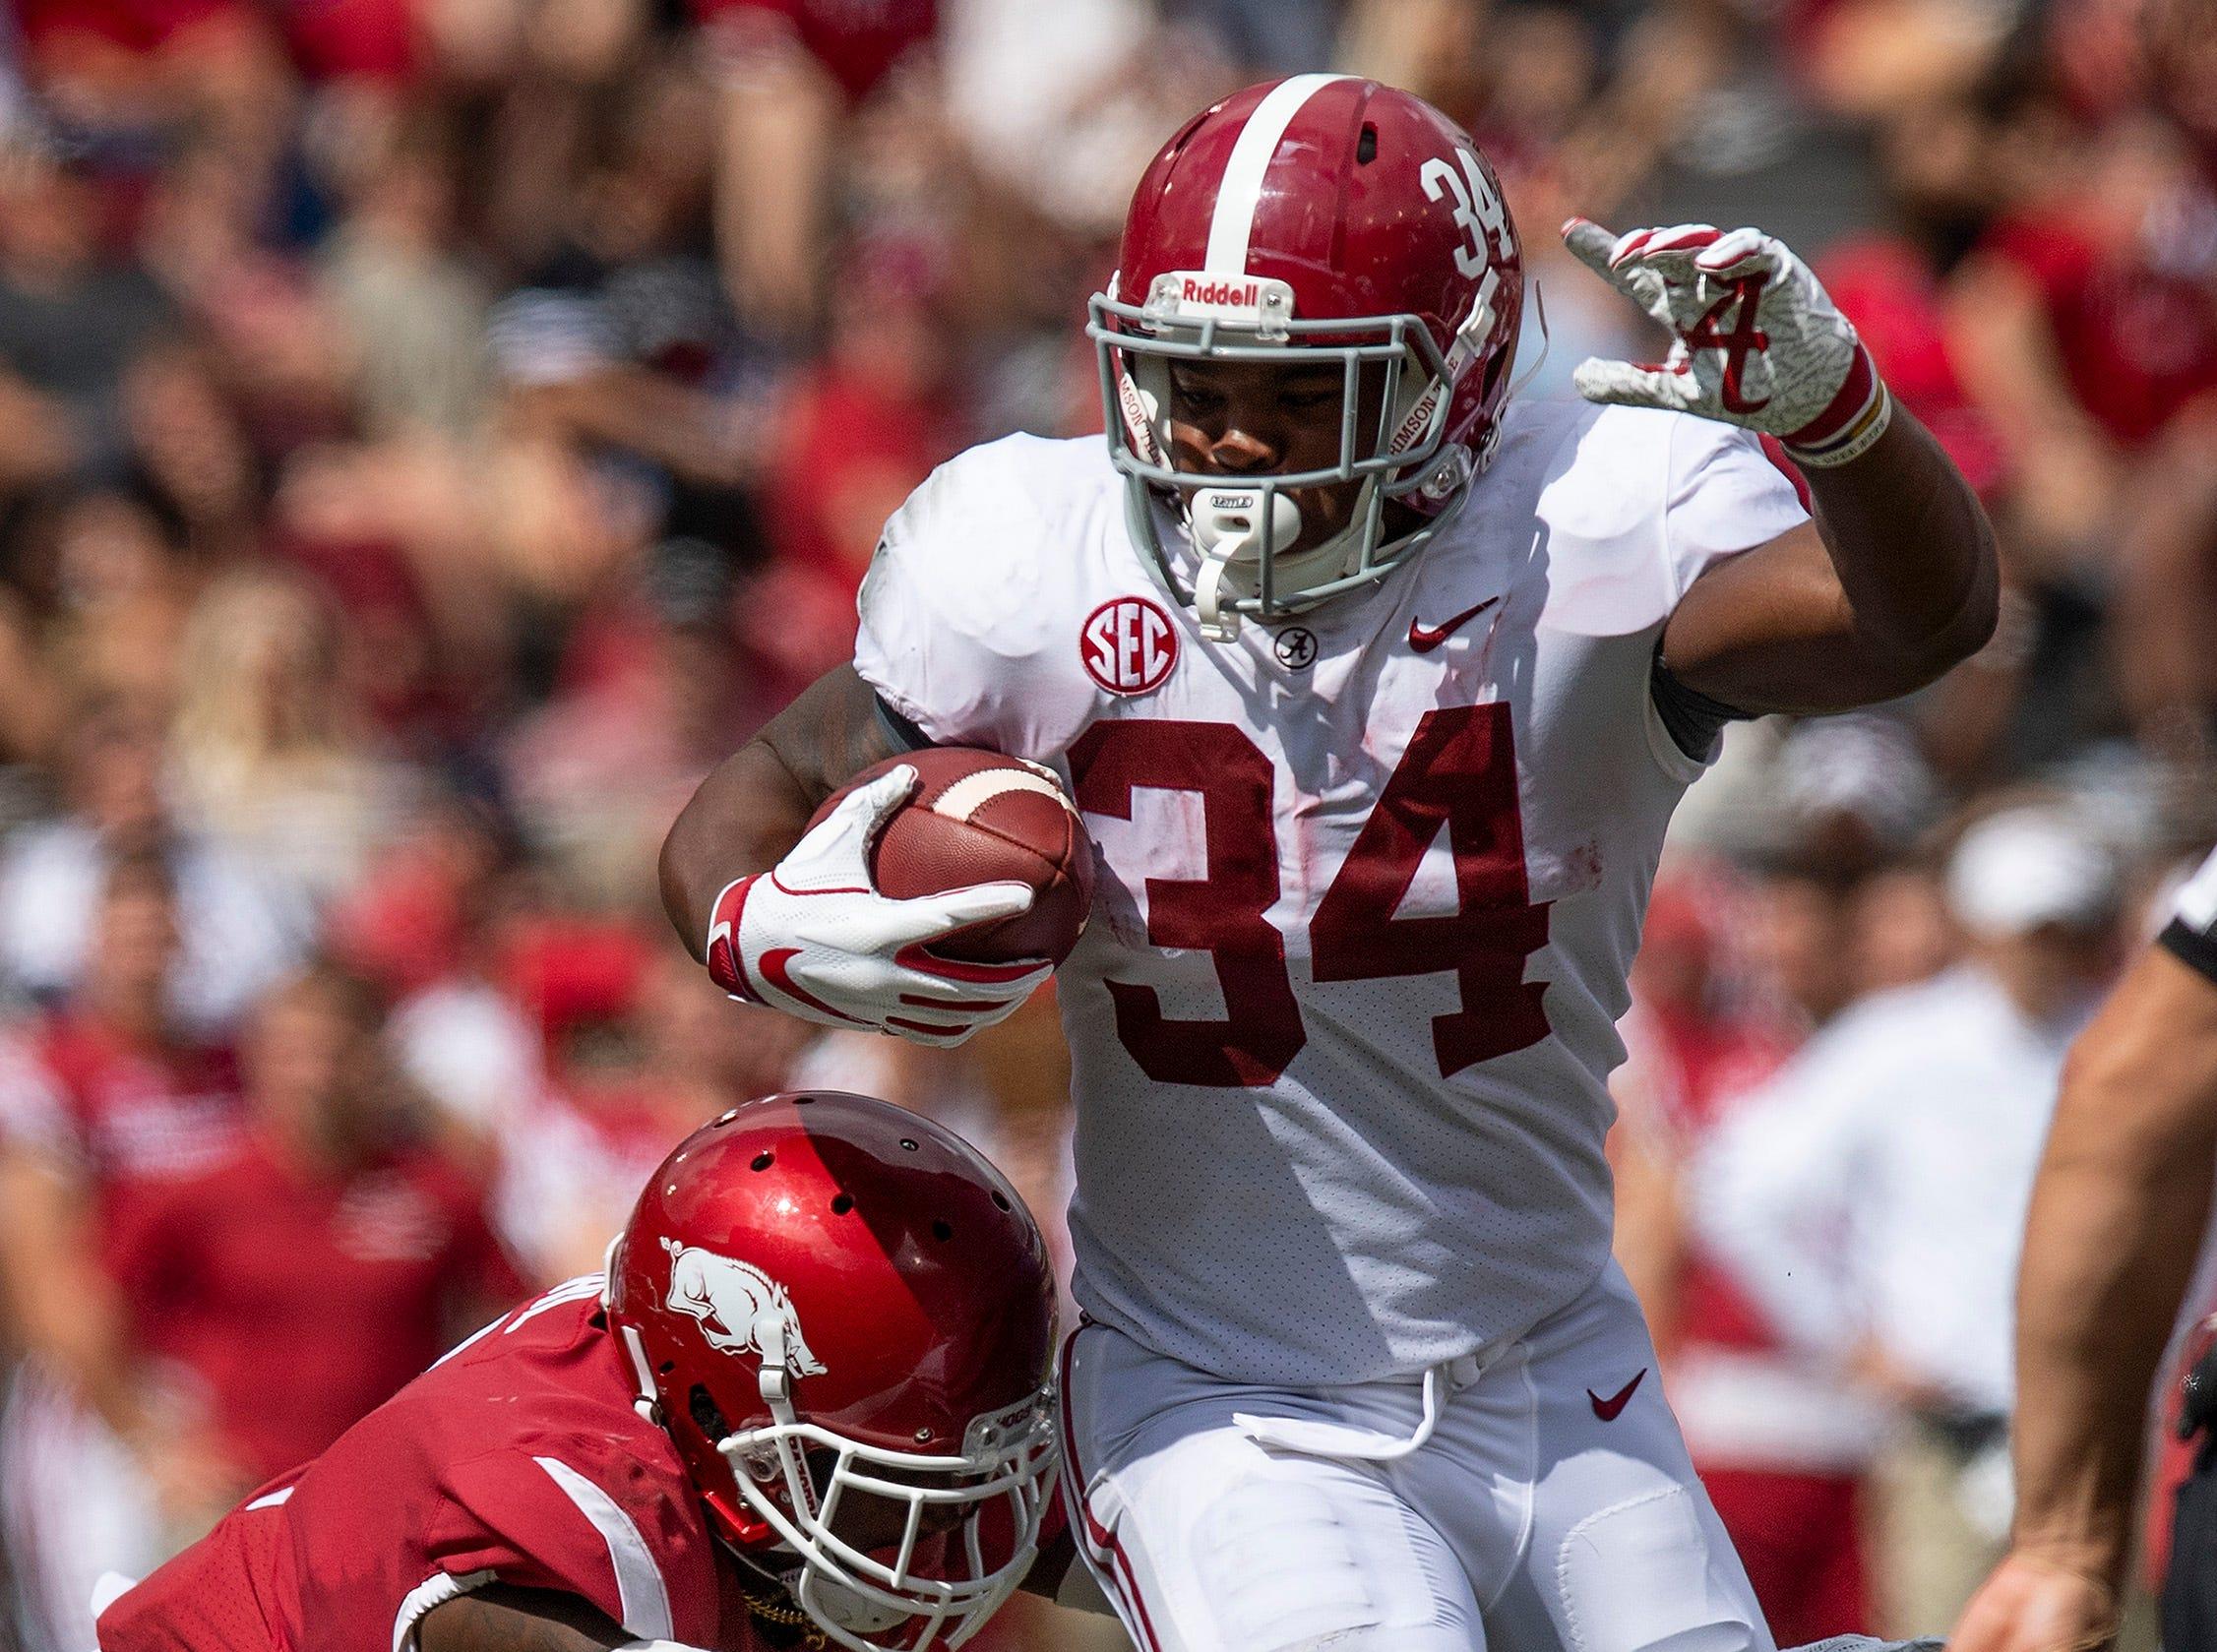 Alabama running back Damien Harris (34) is hit by Arkansas defensive back Kamren Curl (2) during second half action in Fayetteville, Ark., on Saturday October 6, 2018.